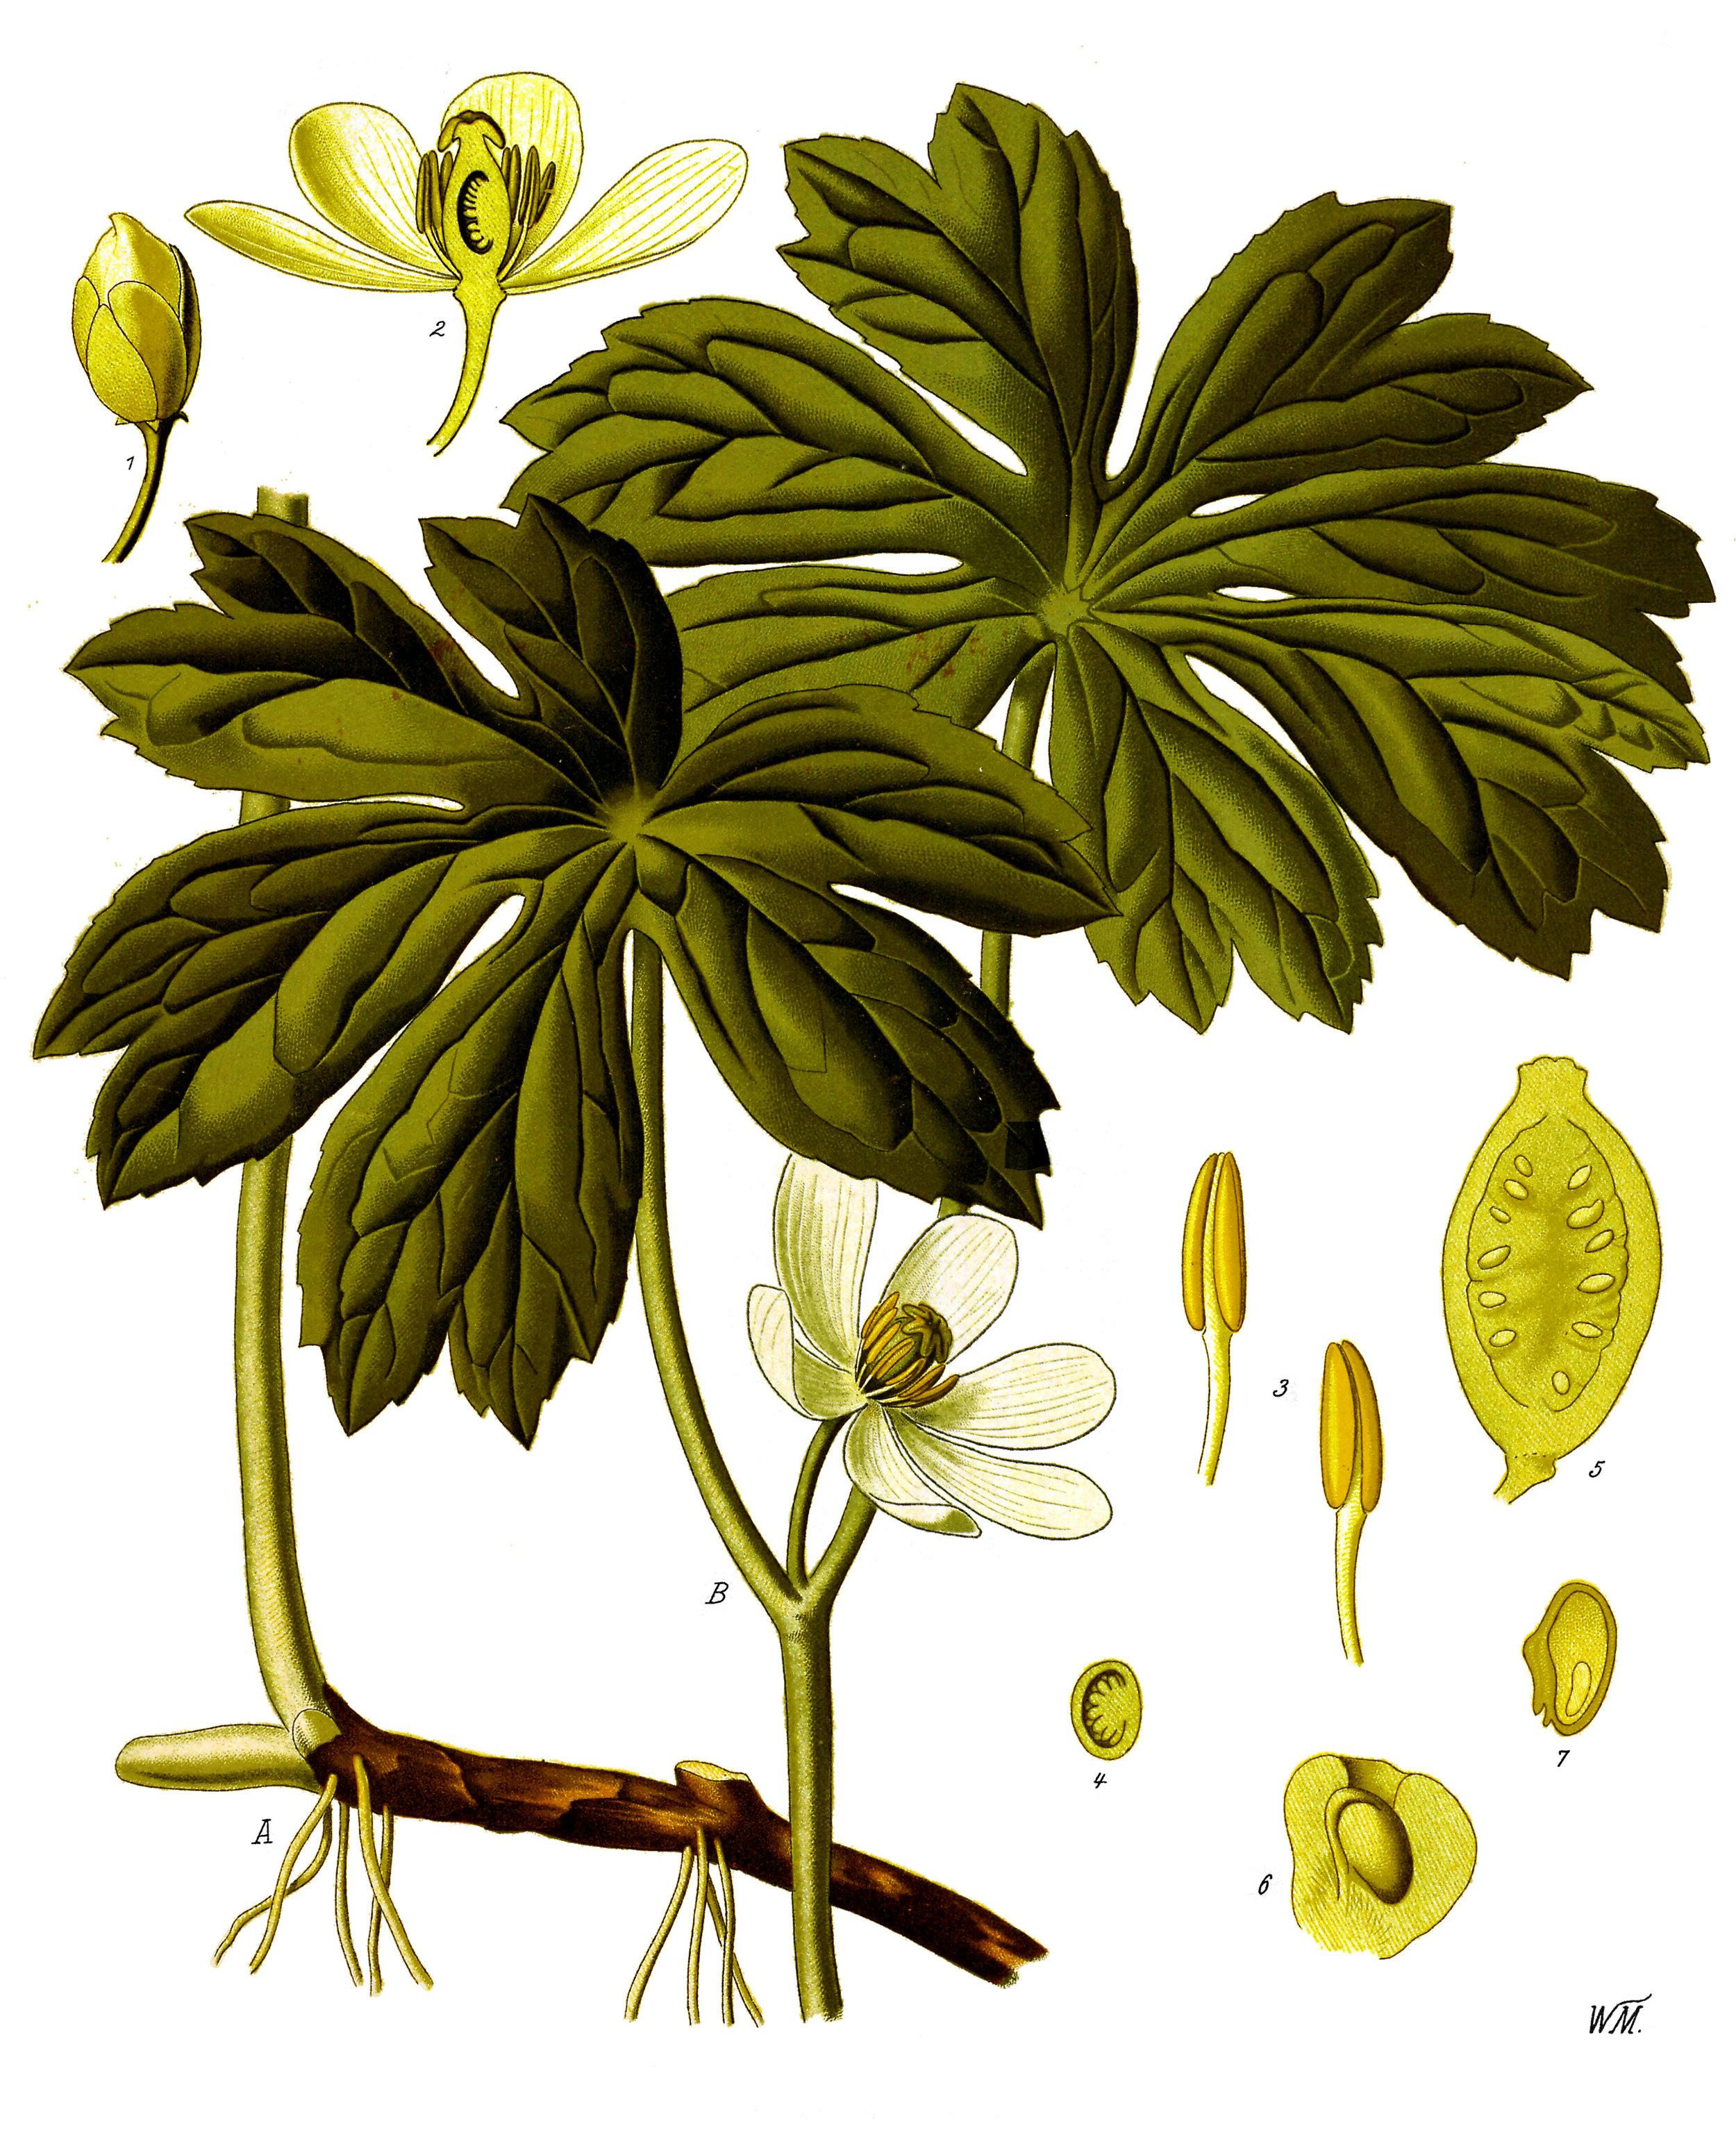 Podophyllum_peltatum_-_Köhler–s_Medizinal-Pflanzen-246.jpg